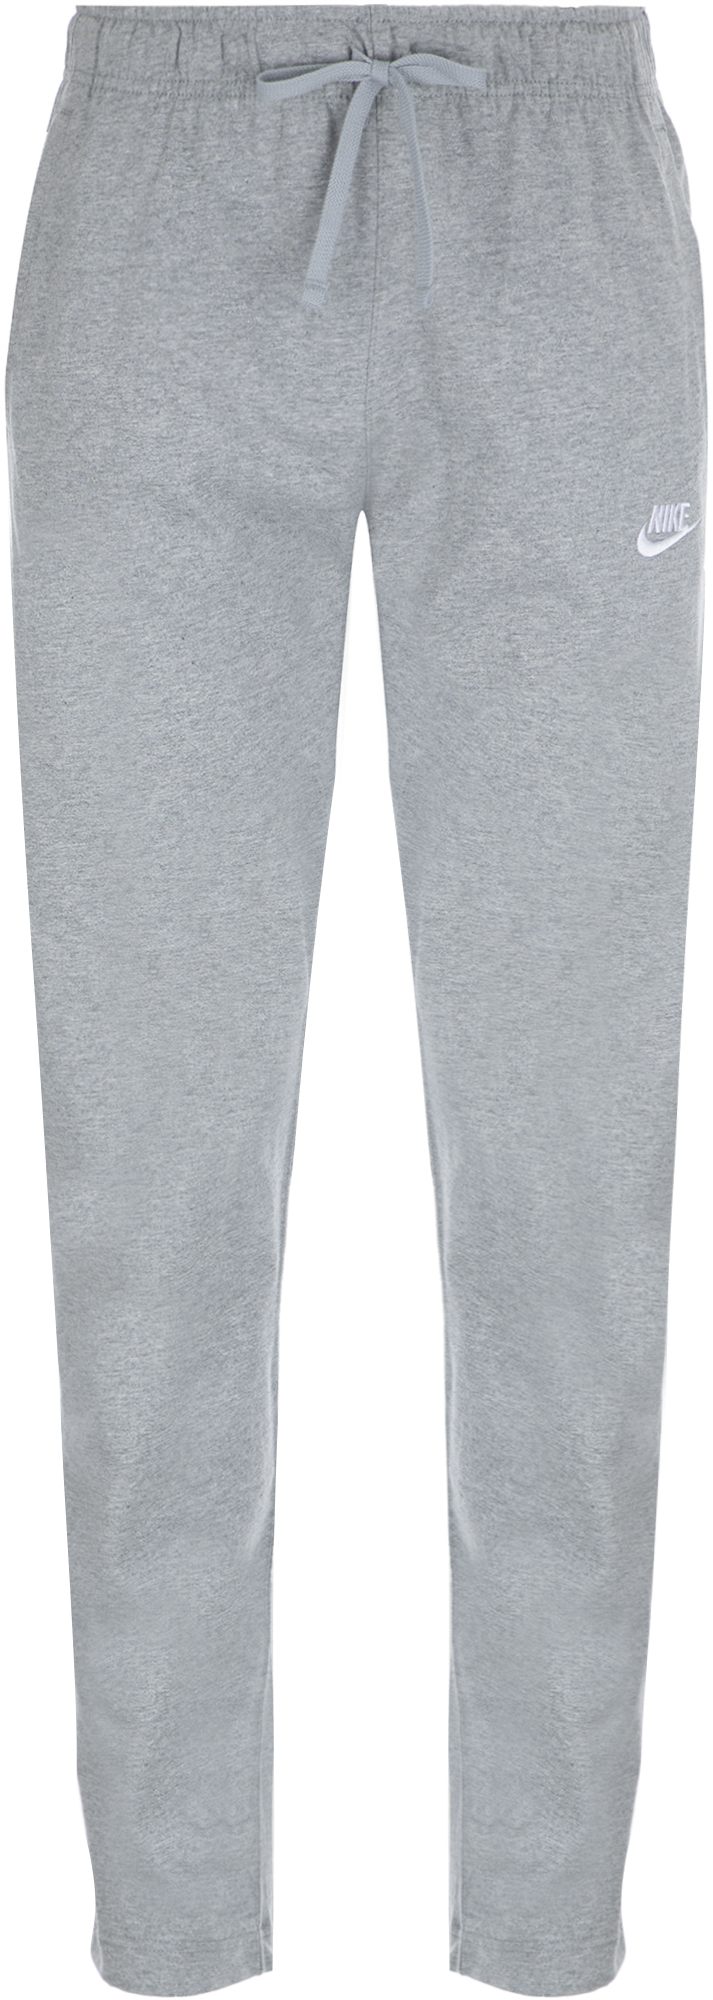 Nike Брюки мужские Sportswear Club, размер 54-56